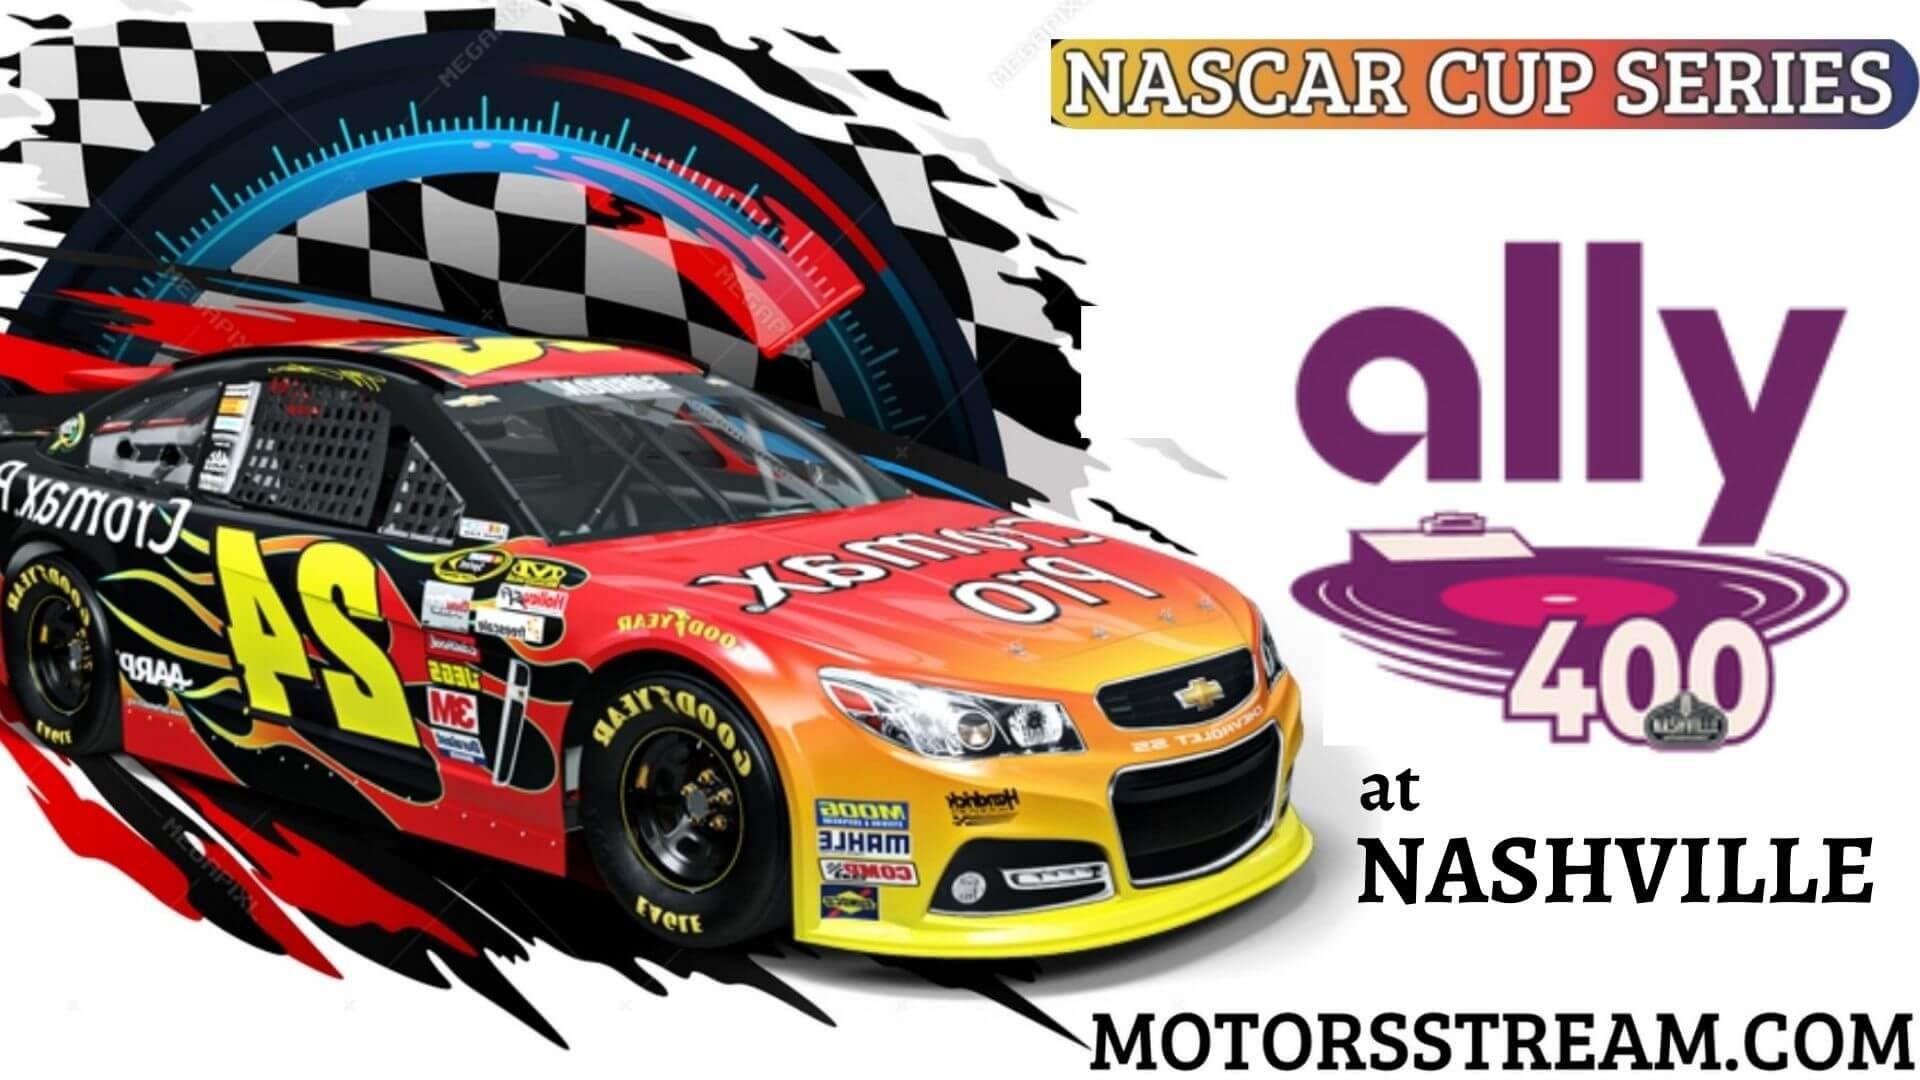 NASCAR Cup Series Ally 400 Live Stream   Nashville 2021